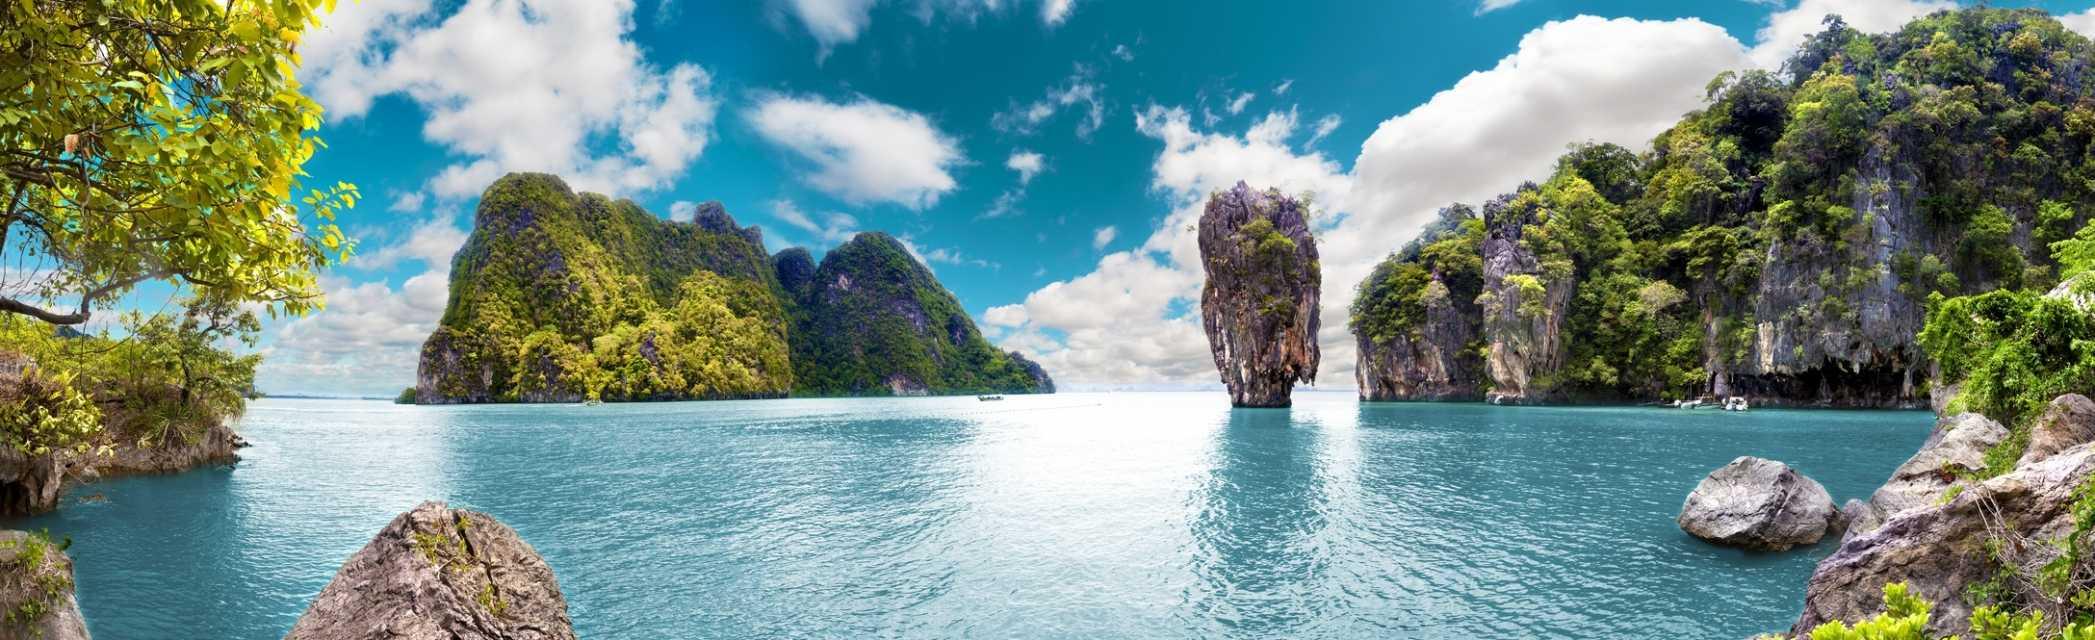 tv zofe thailand urlaub sextourismus